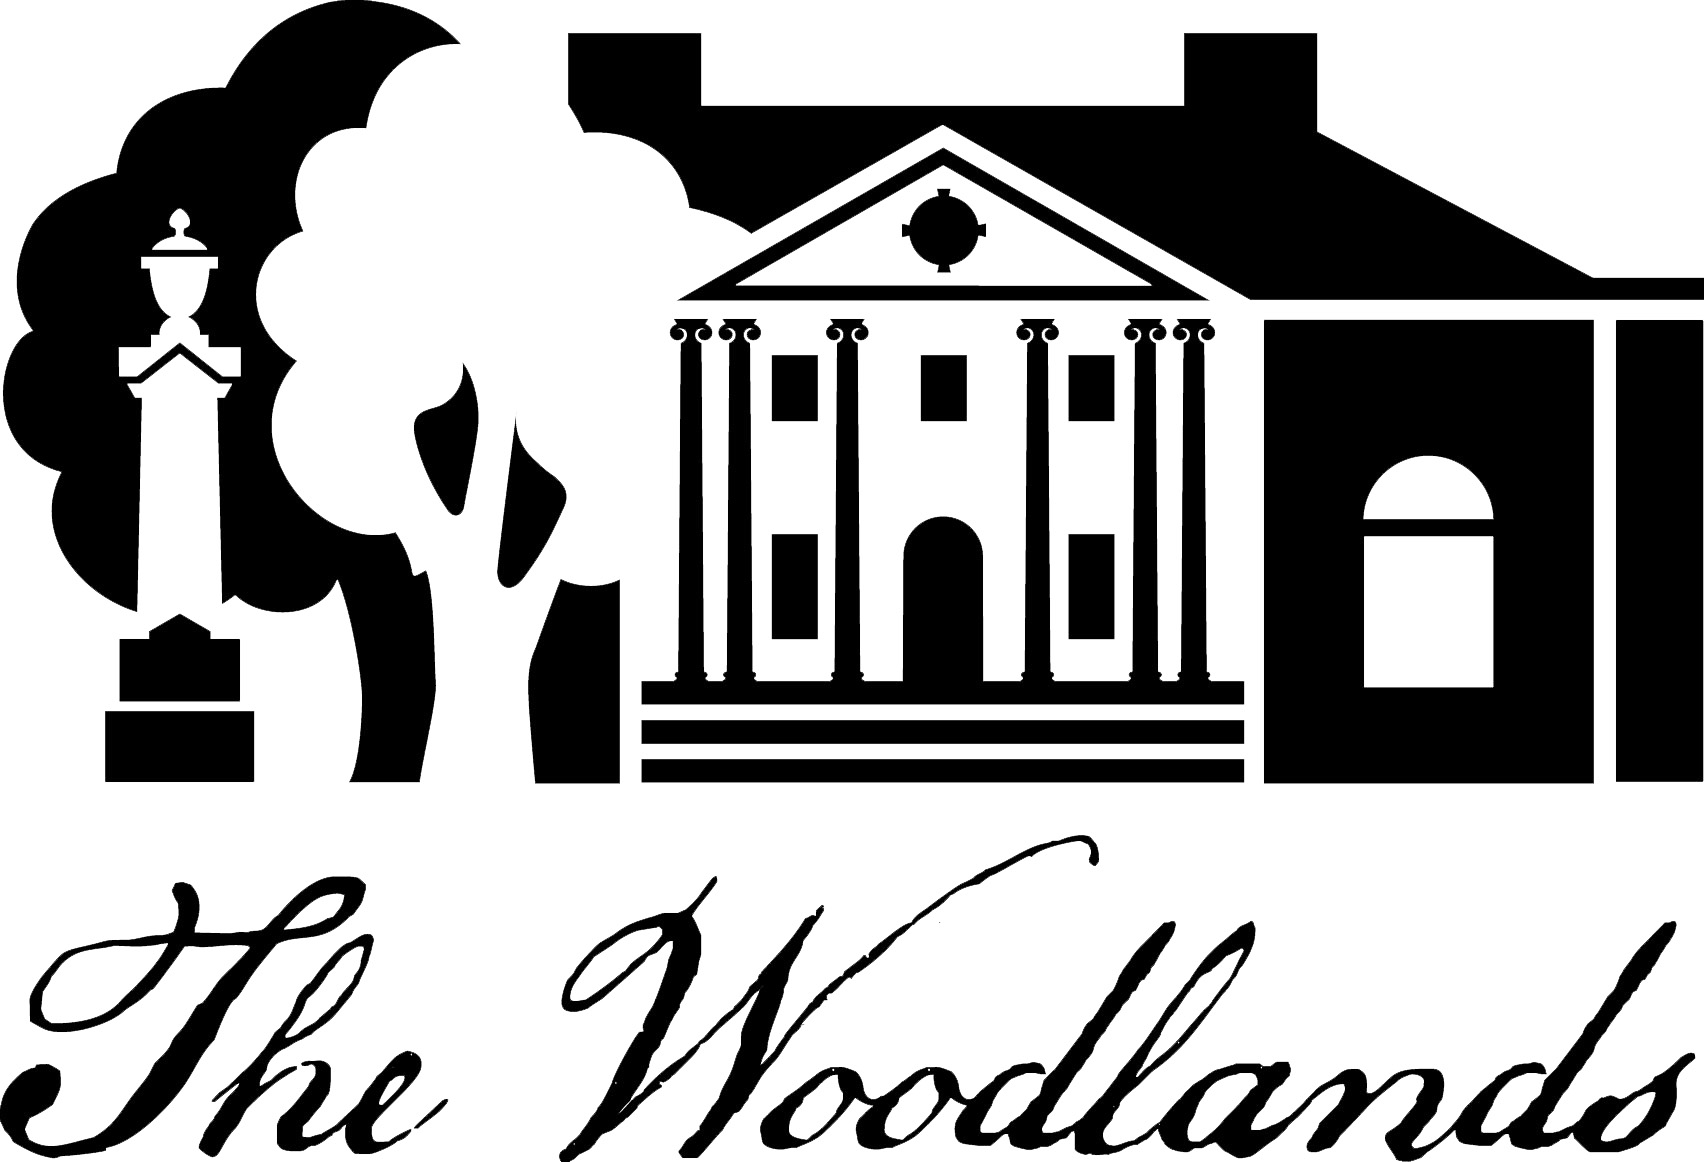 WoodlandsLogo2.jpg